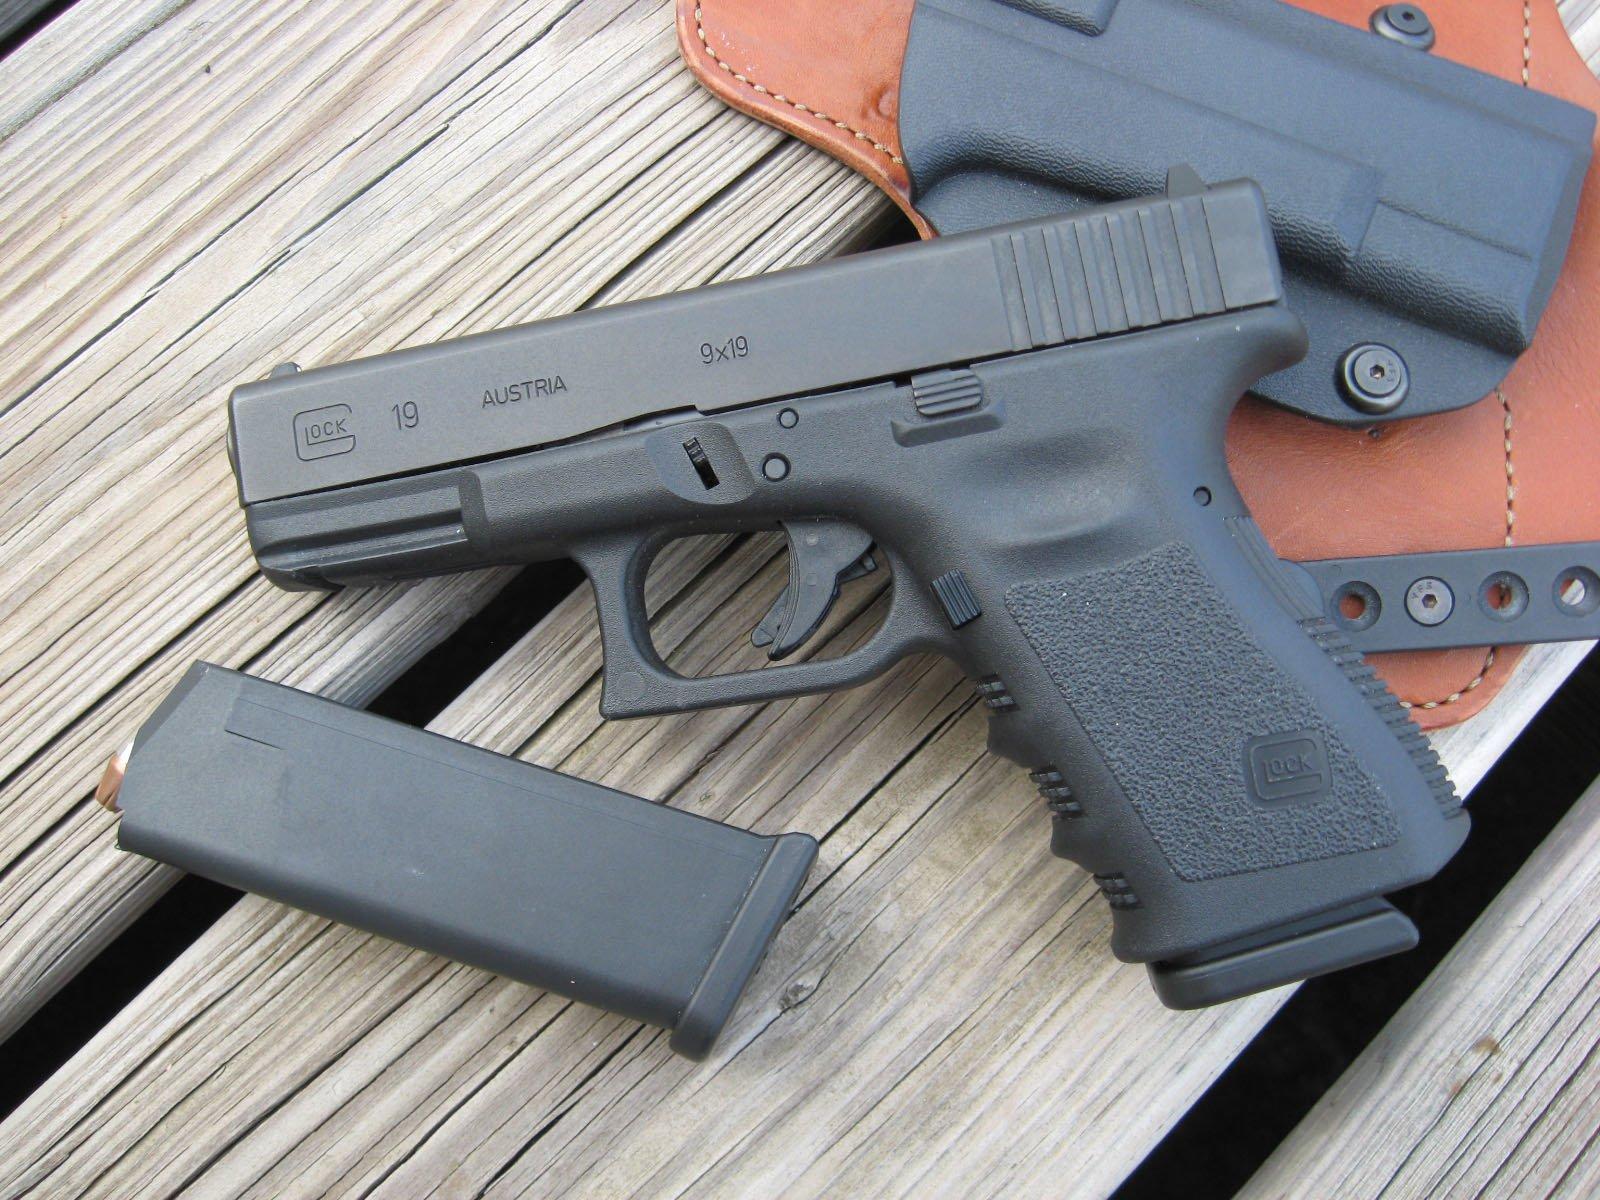 Glock pistol wallpaper and background image 1600x1200 - Glock wallpaper ...